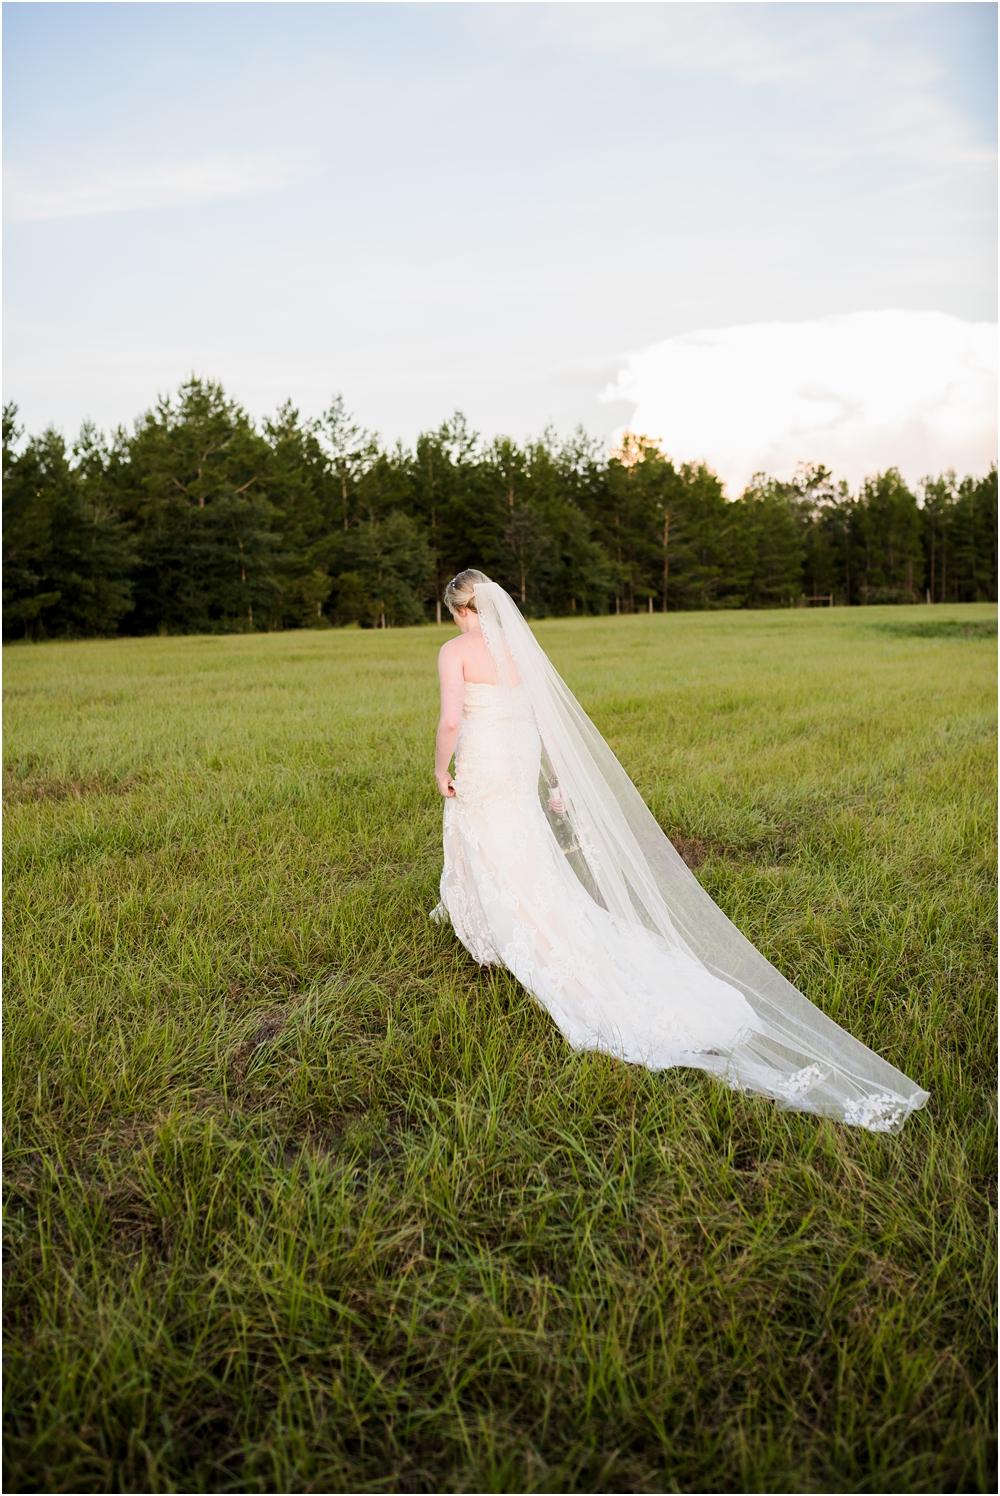 matthew-wedding-kiersten-stevenson-photography-30a-panama-city-beach-dothan-tallahassee-(408-of-579).JPG